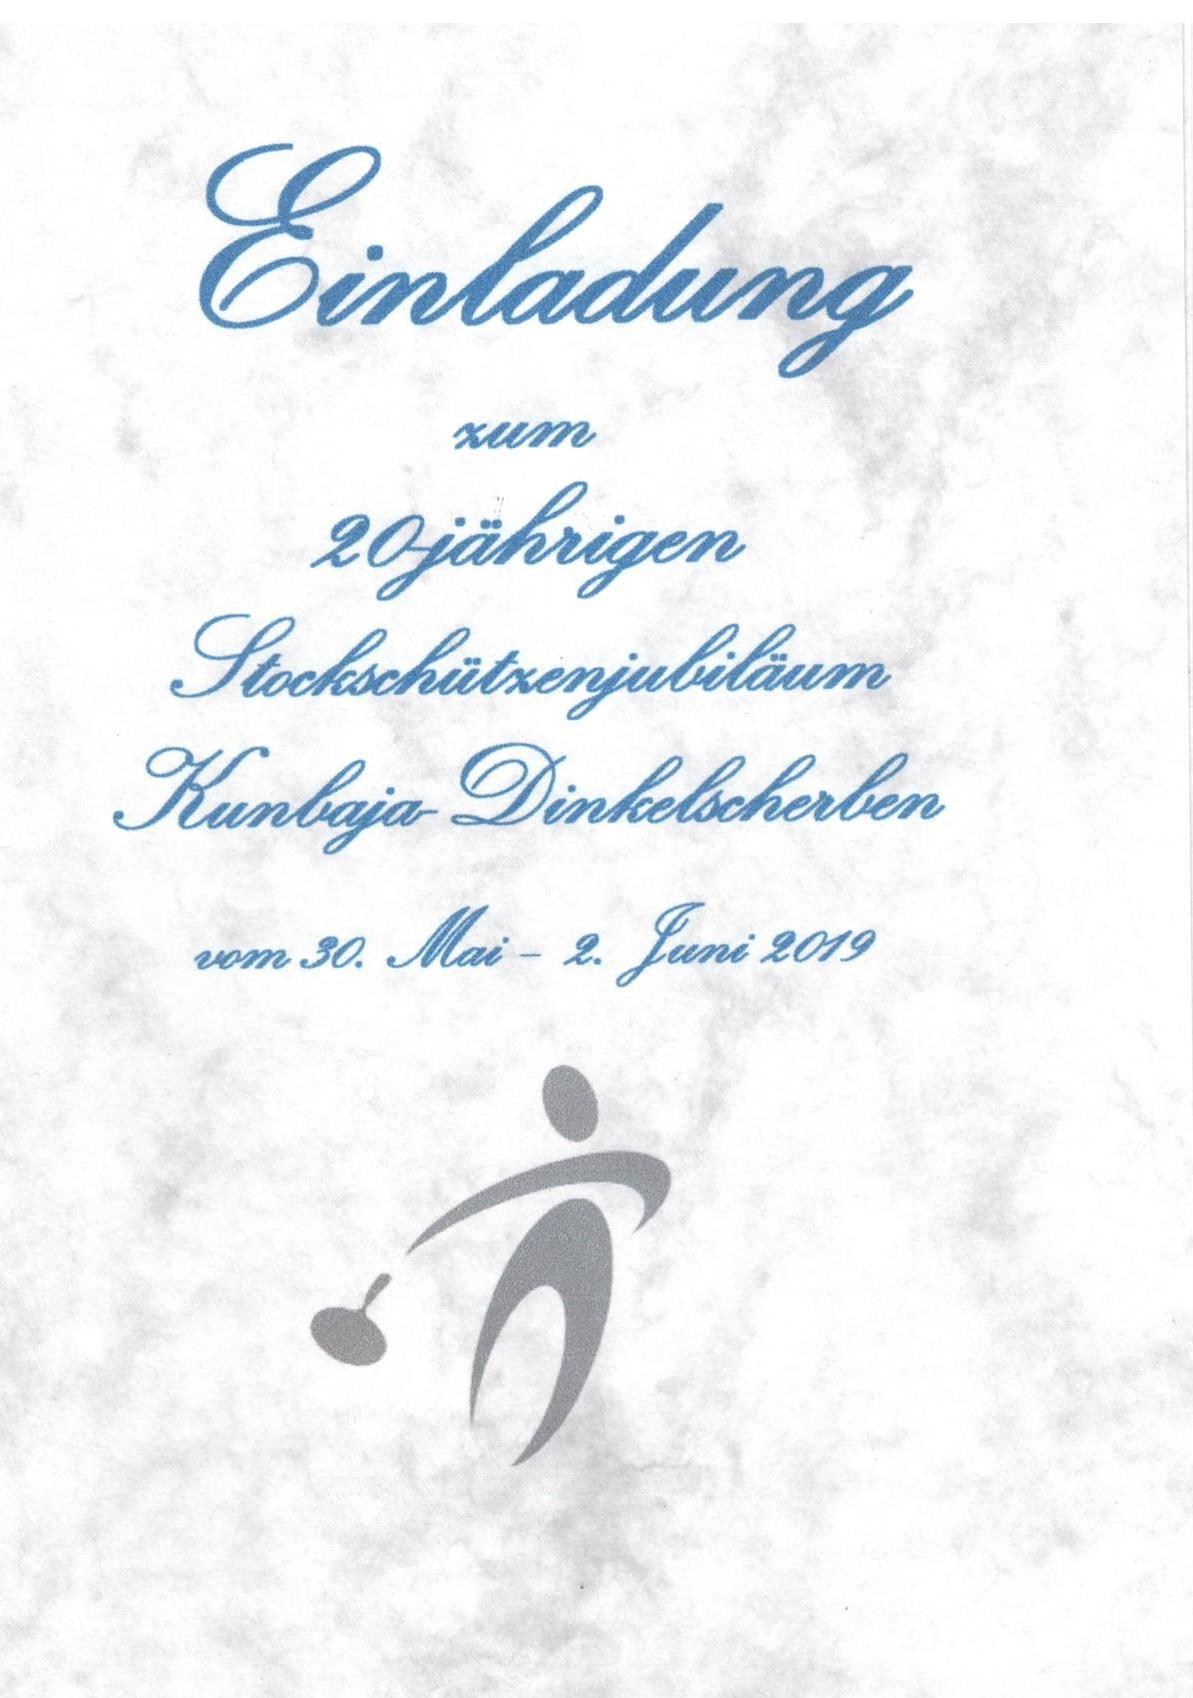 Einladung zum 20-jährigen Stockschützenjubiläum Kunbaja-Dinkelscherben